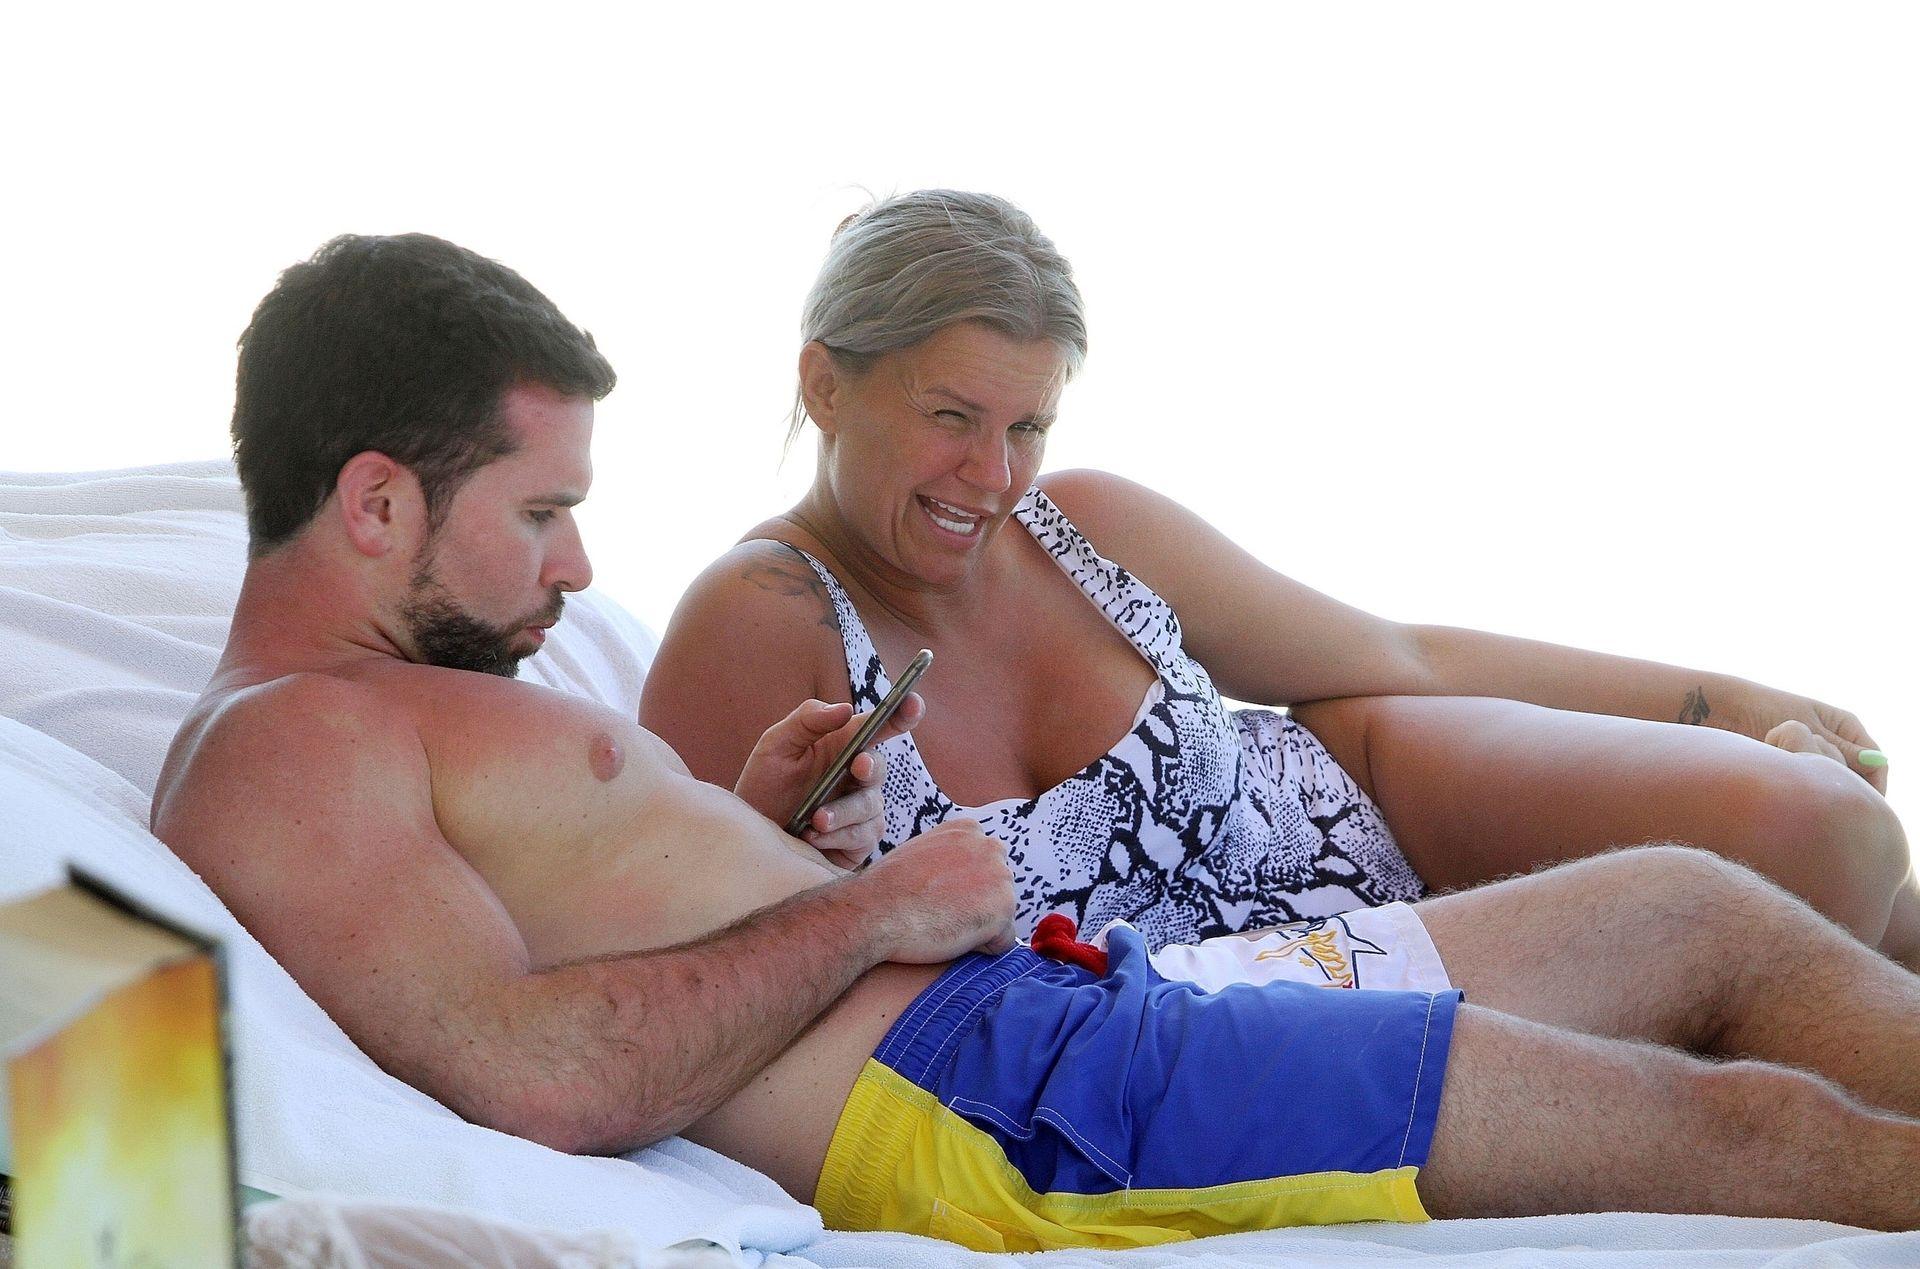 Kerry Katona & Ryan Mahoney Hit The Beach On Holiday At Their Luxury 5 Star Resort Ayada Maldives 0037